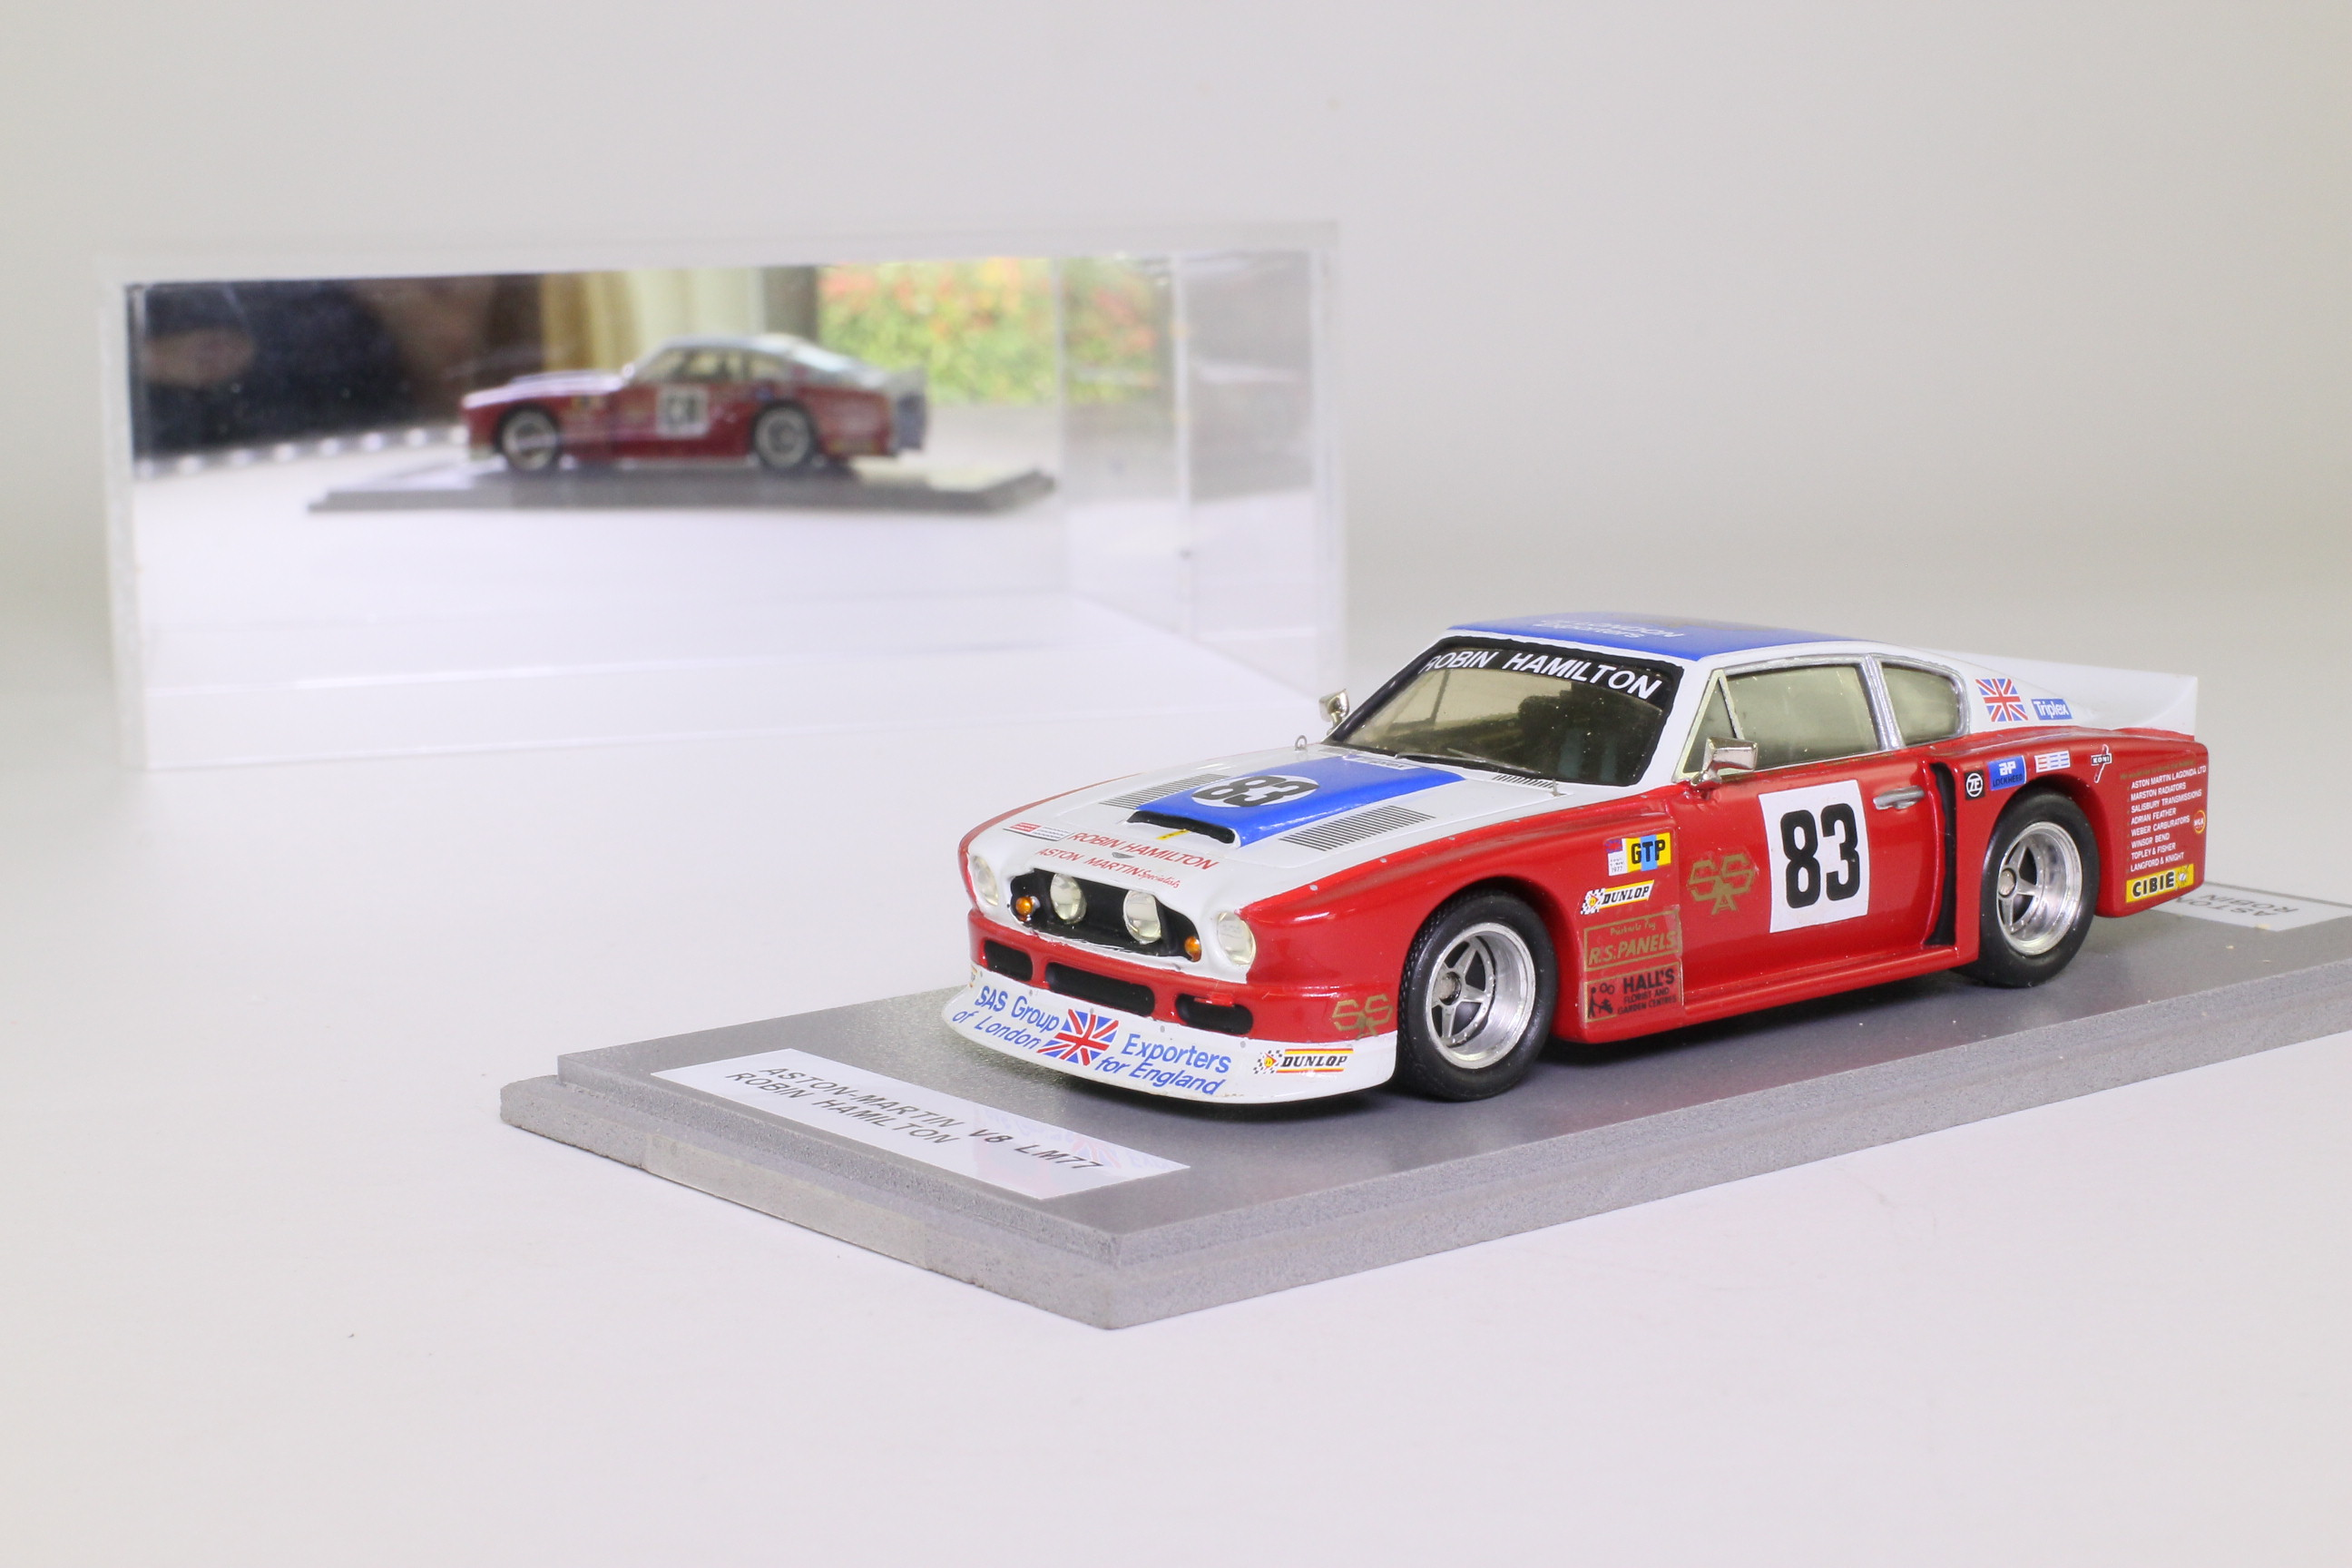 Provence Moulage; Aston Martin V8; 1977 24h Le Mans 17th; Hamilton, Salmon, Preece; RN83